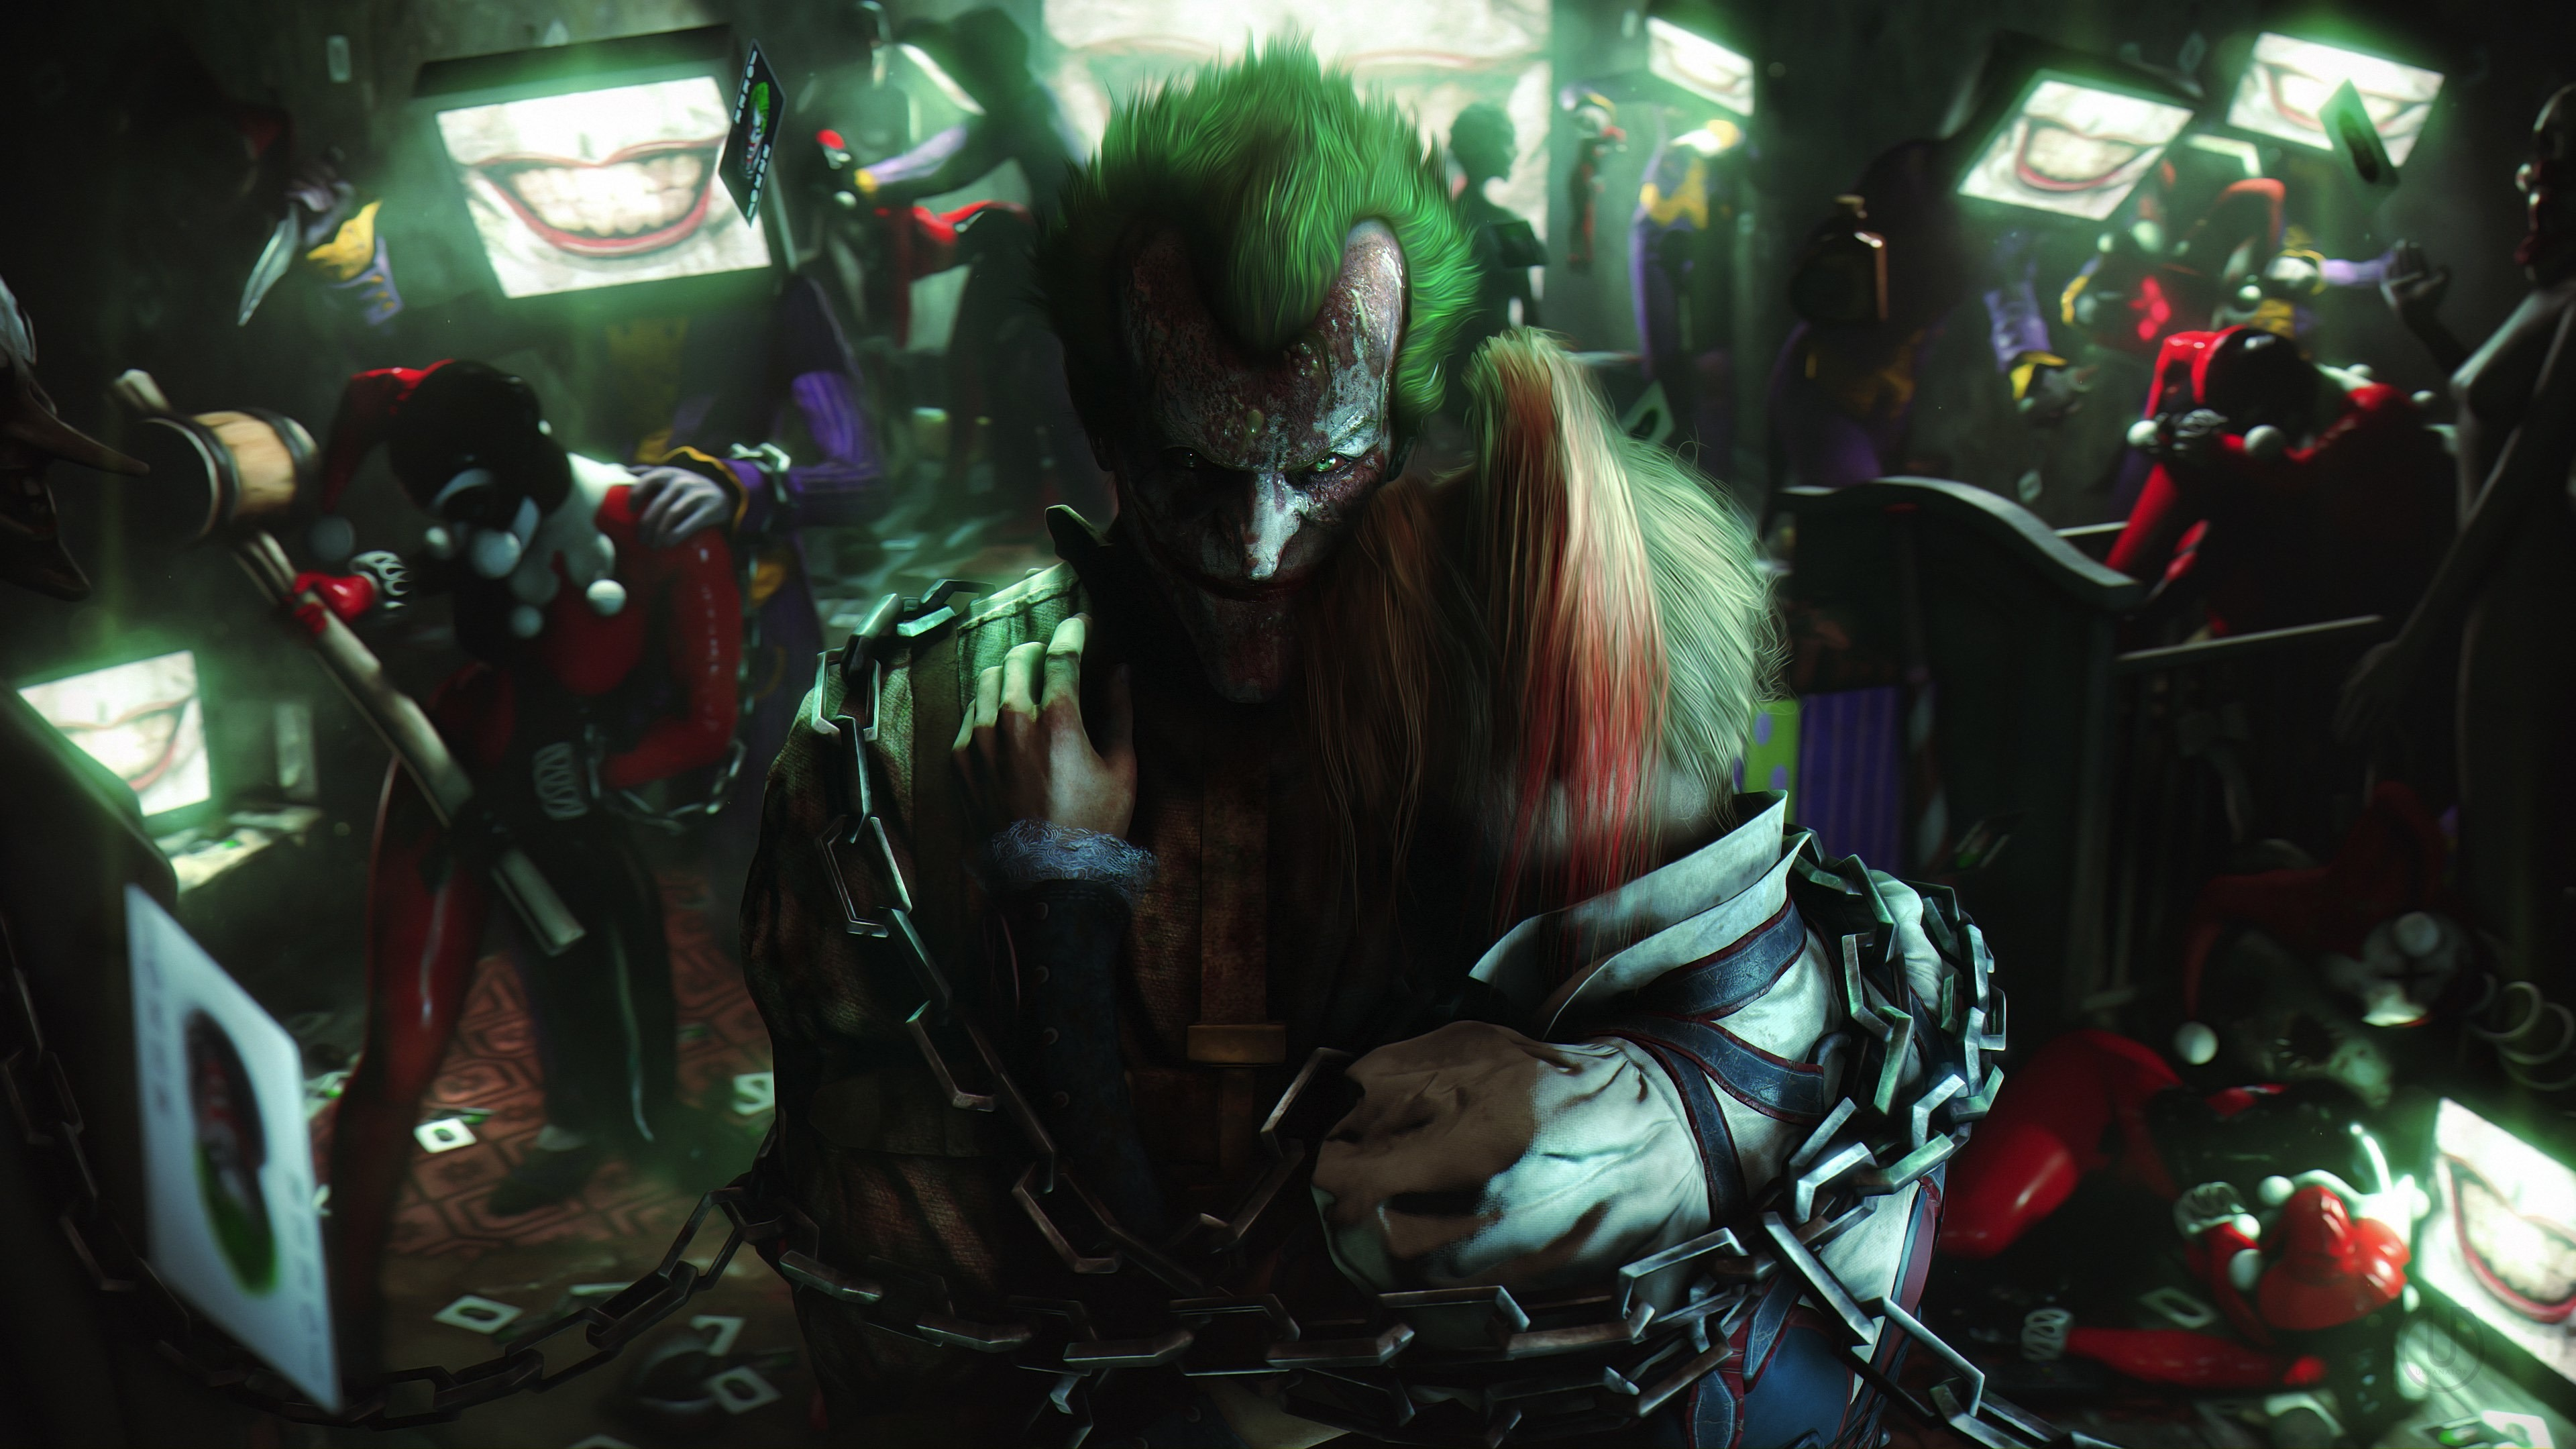 Download 3840x2400 Wallpaper Batman: Arkham City, Joker